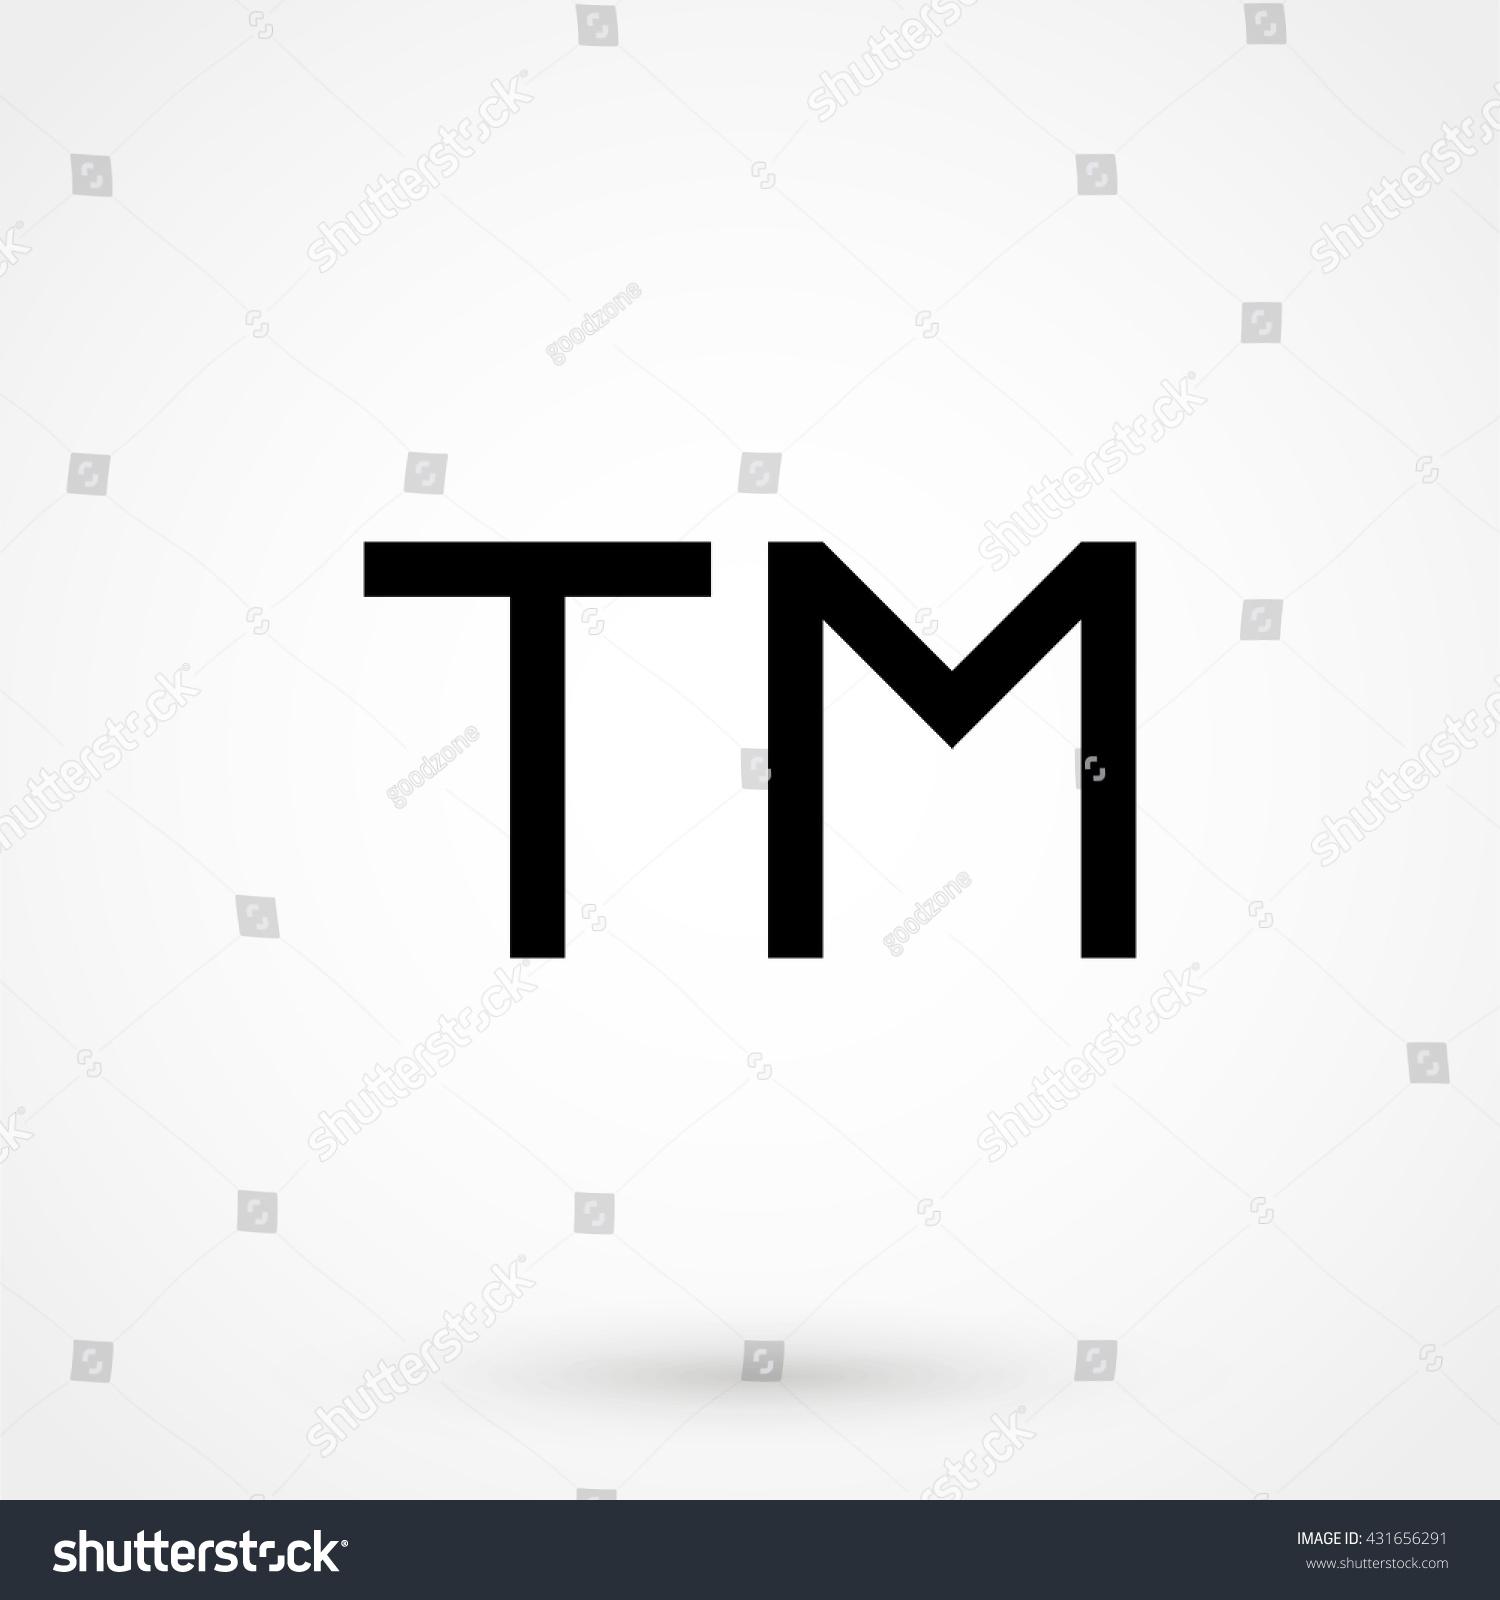 Trademark symbol isolated on background modern stock vector trademark symbol isolated on background modern flat pictogram business marketing internet concept buycottarizona